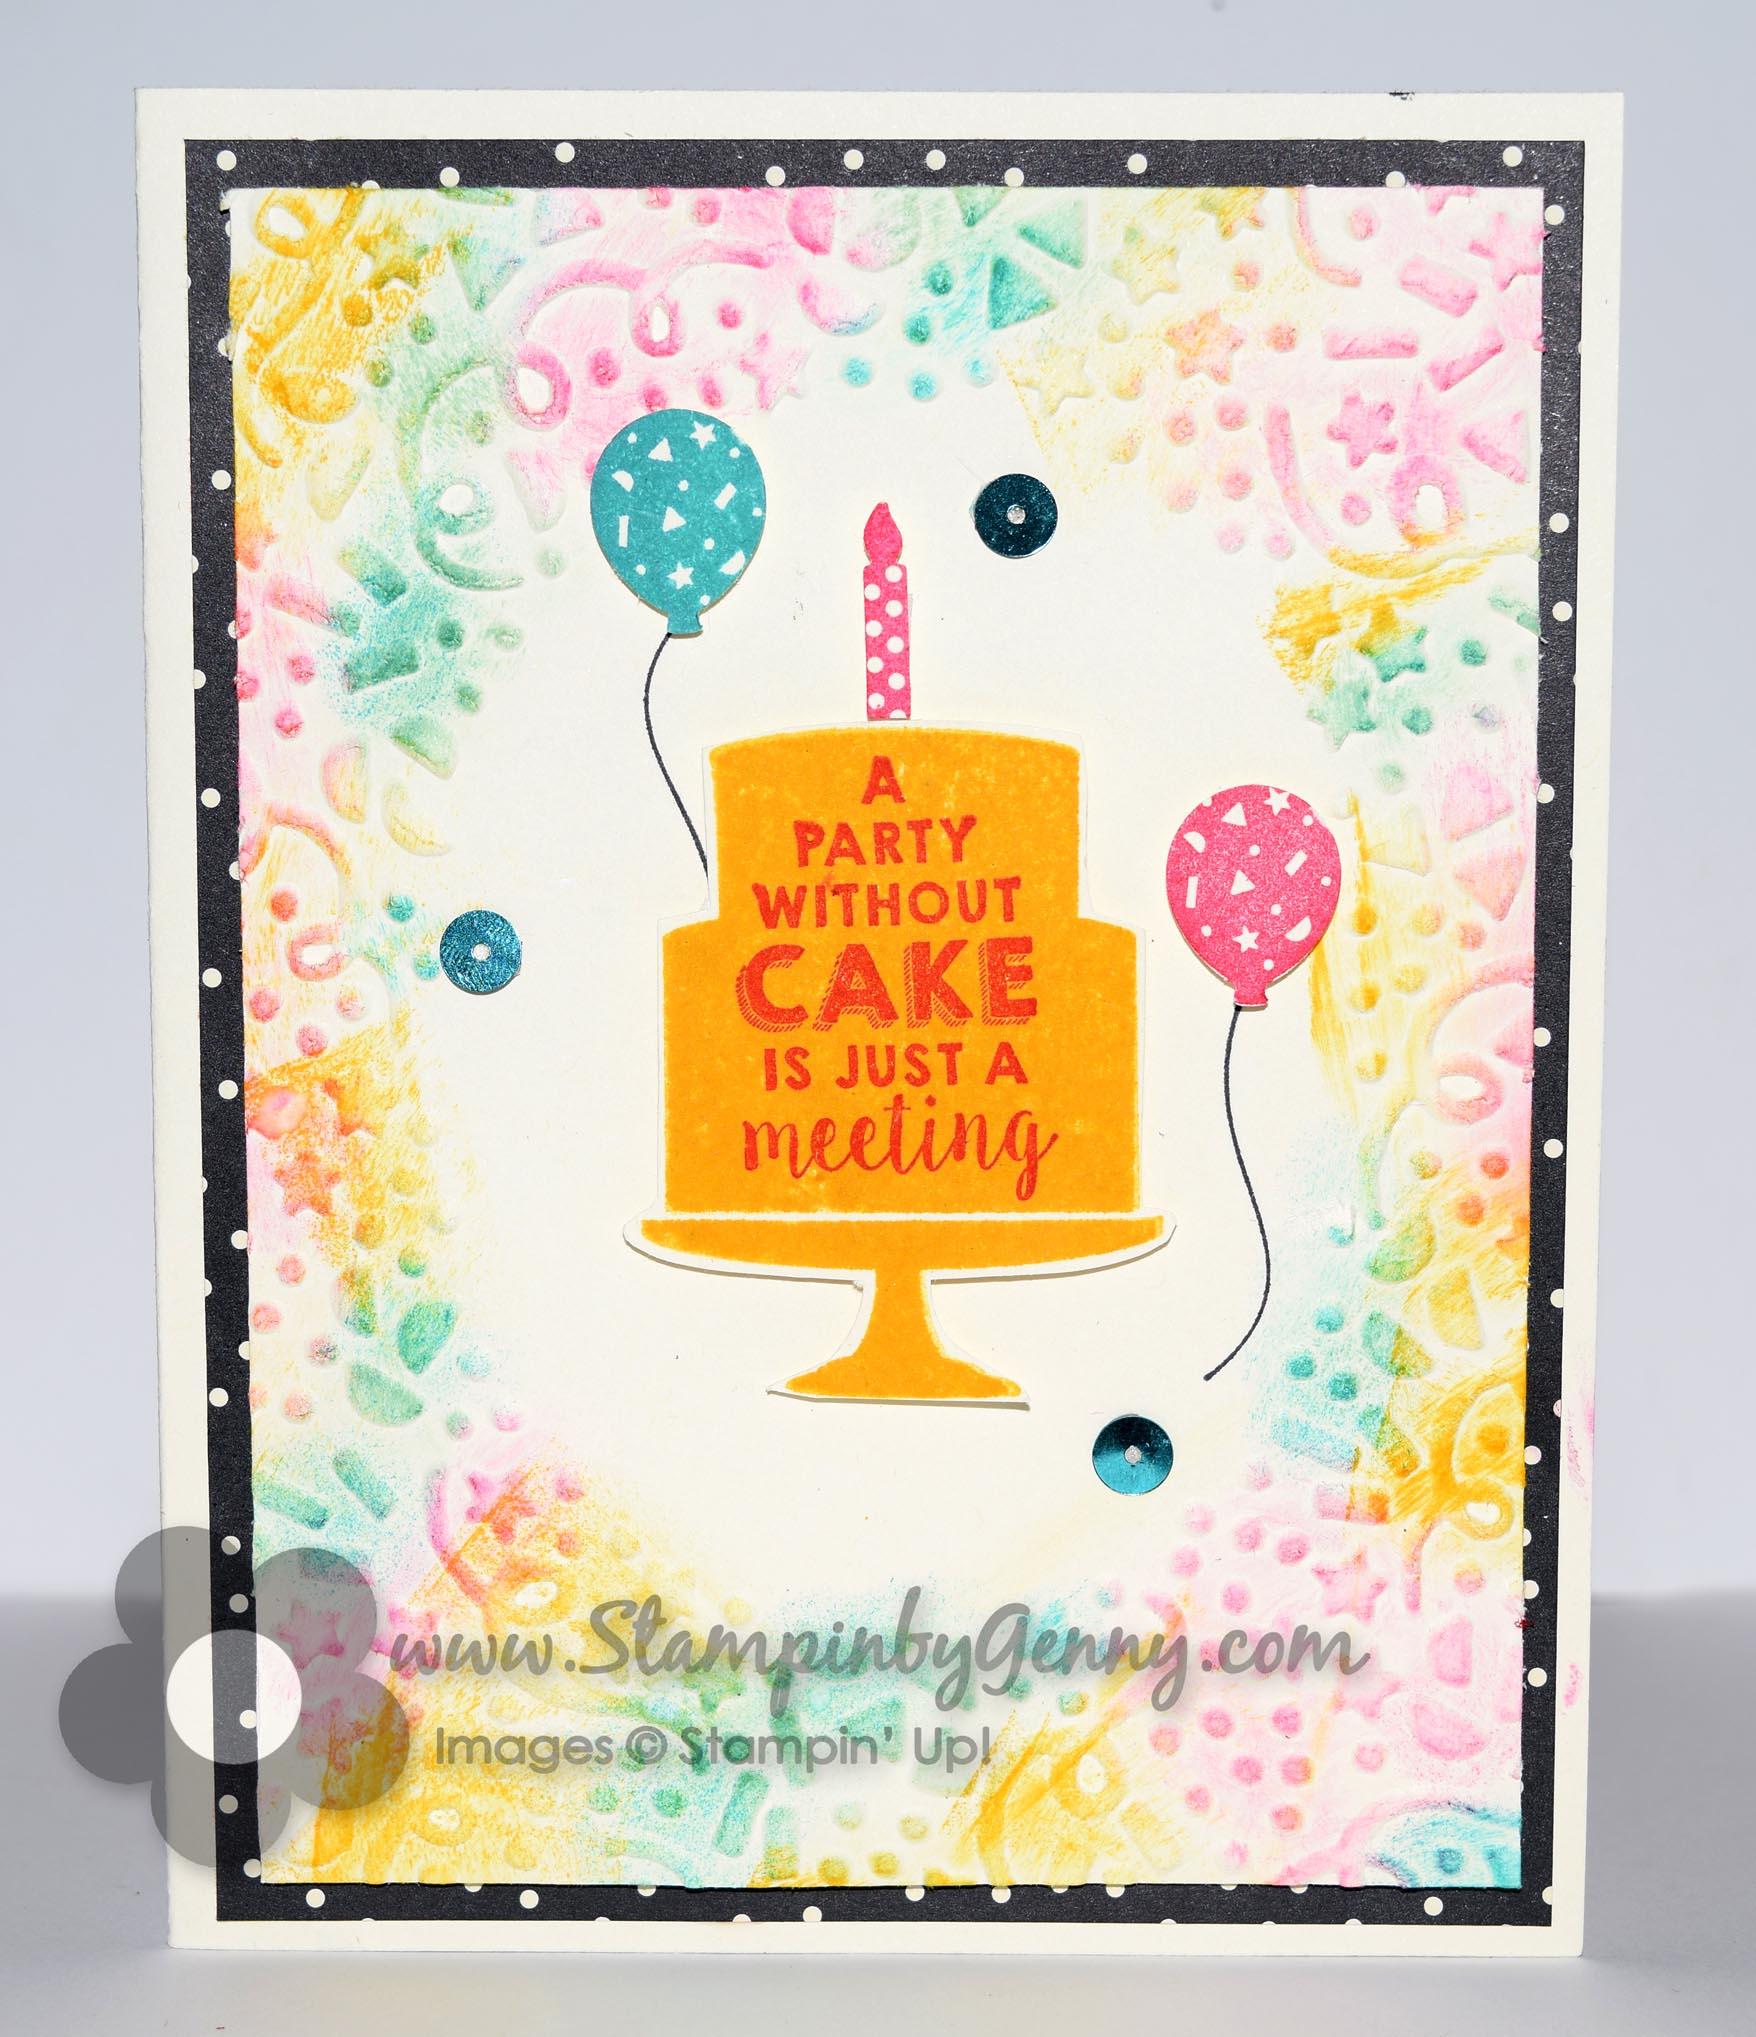 stampin up birthday cards  stampin' by genny's blog, Birthday card